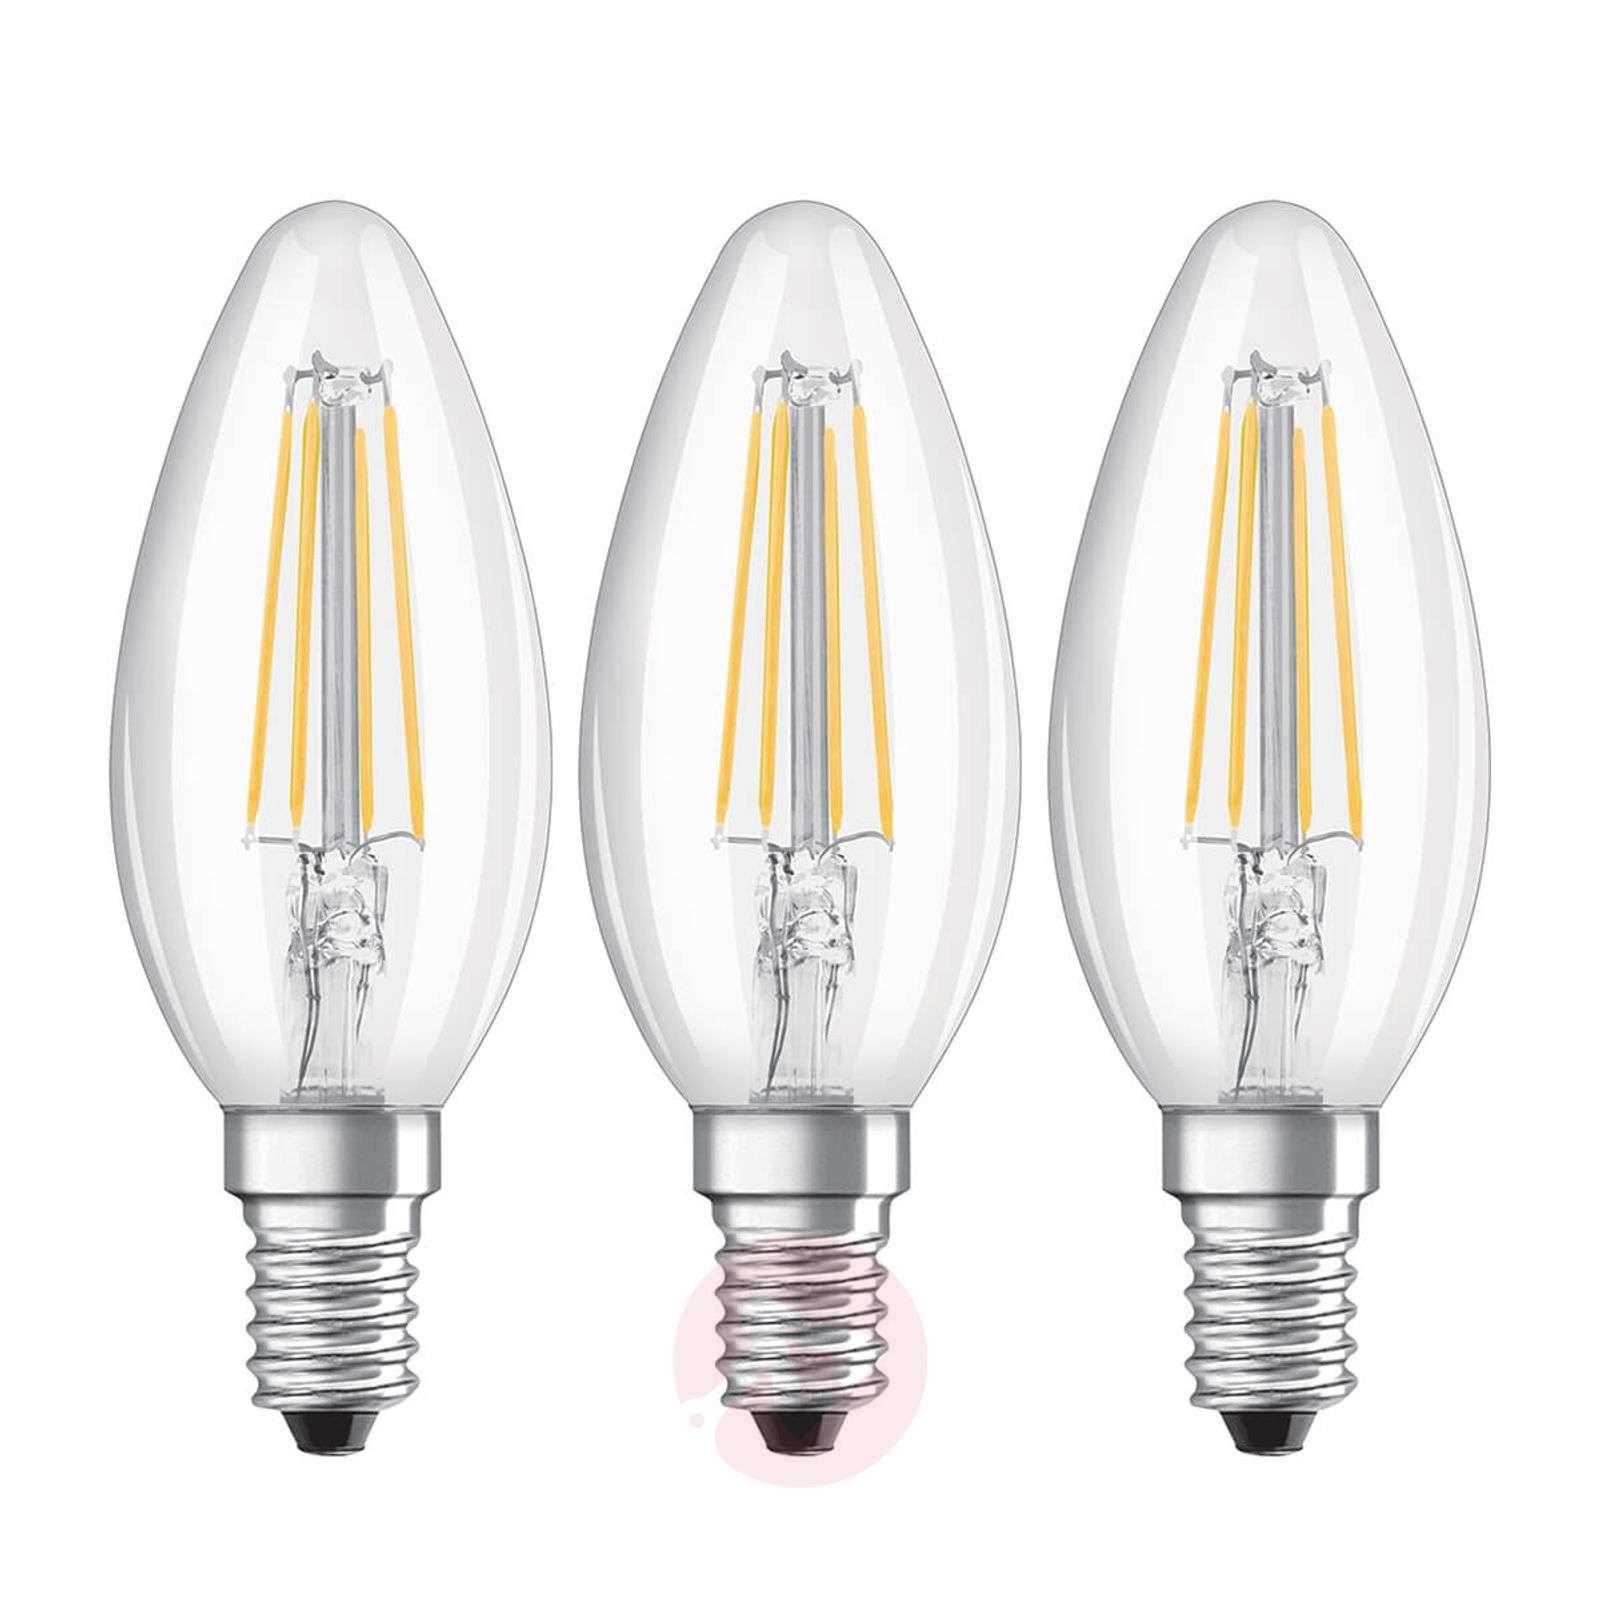 LED filament bulb E14 4W, warm white, set of 3-7262098-01